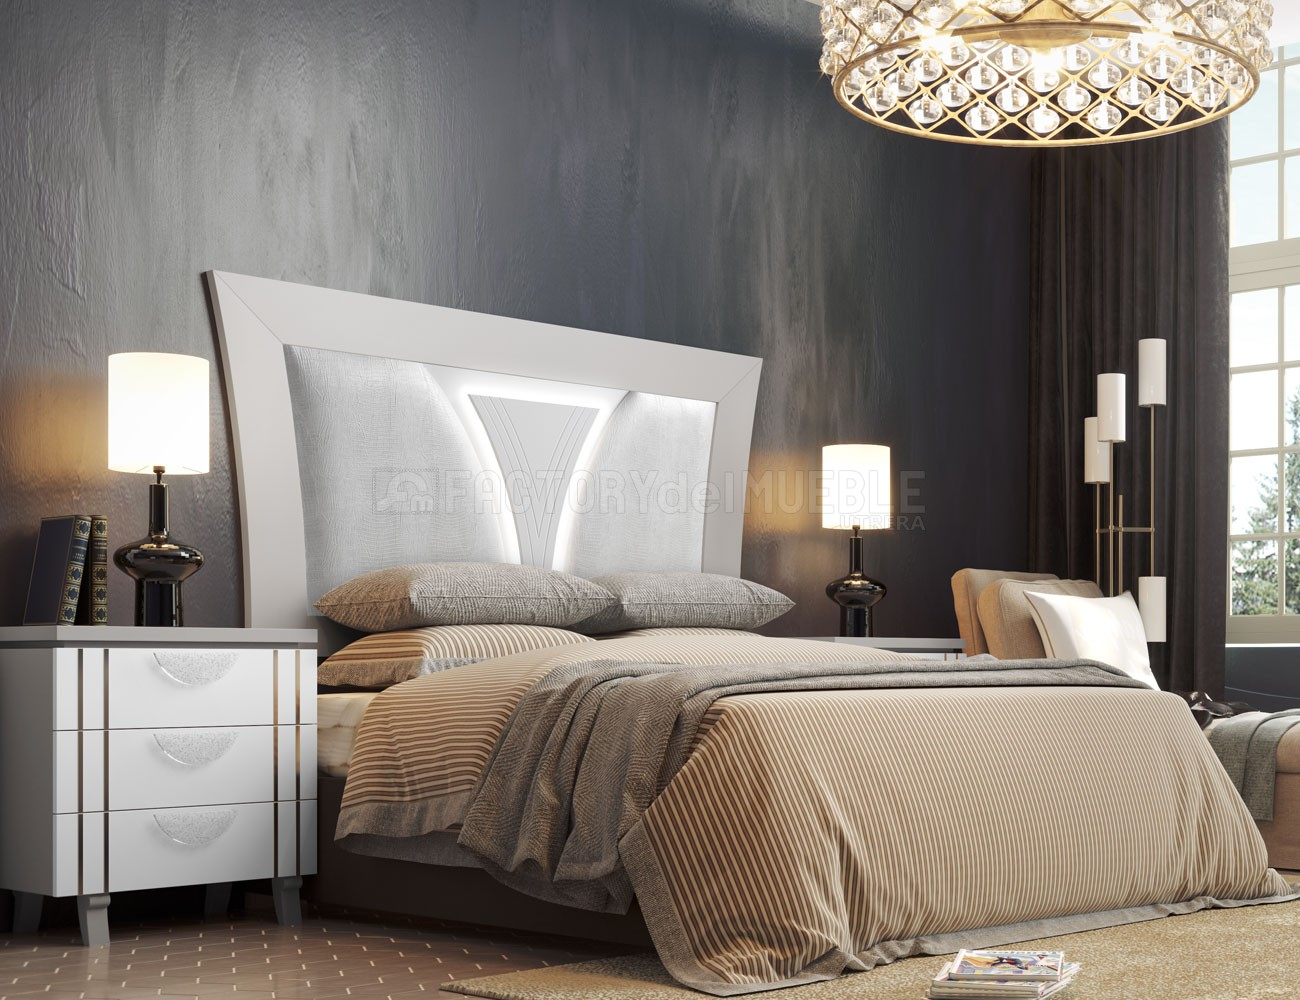 Dormitorio sofia